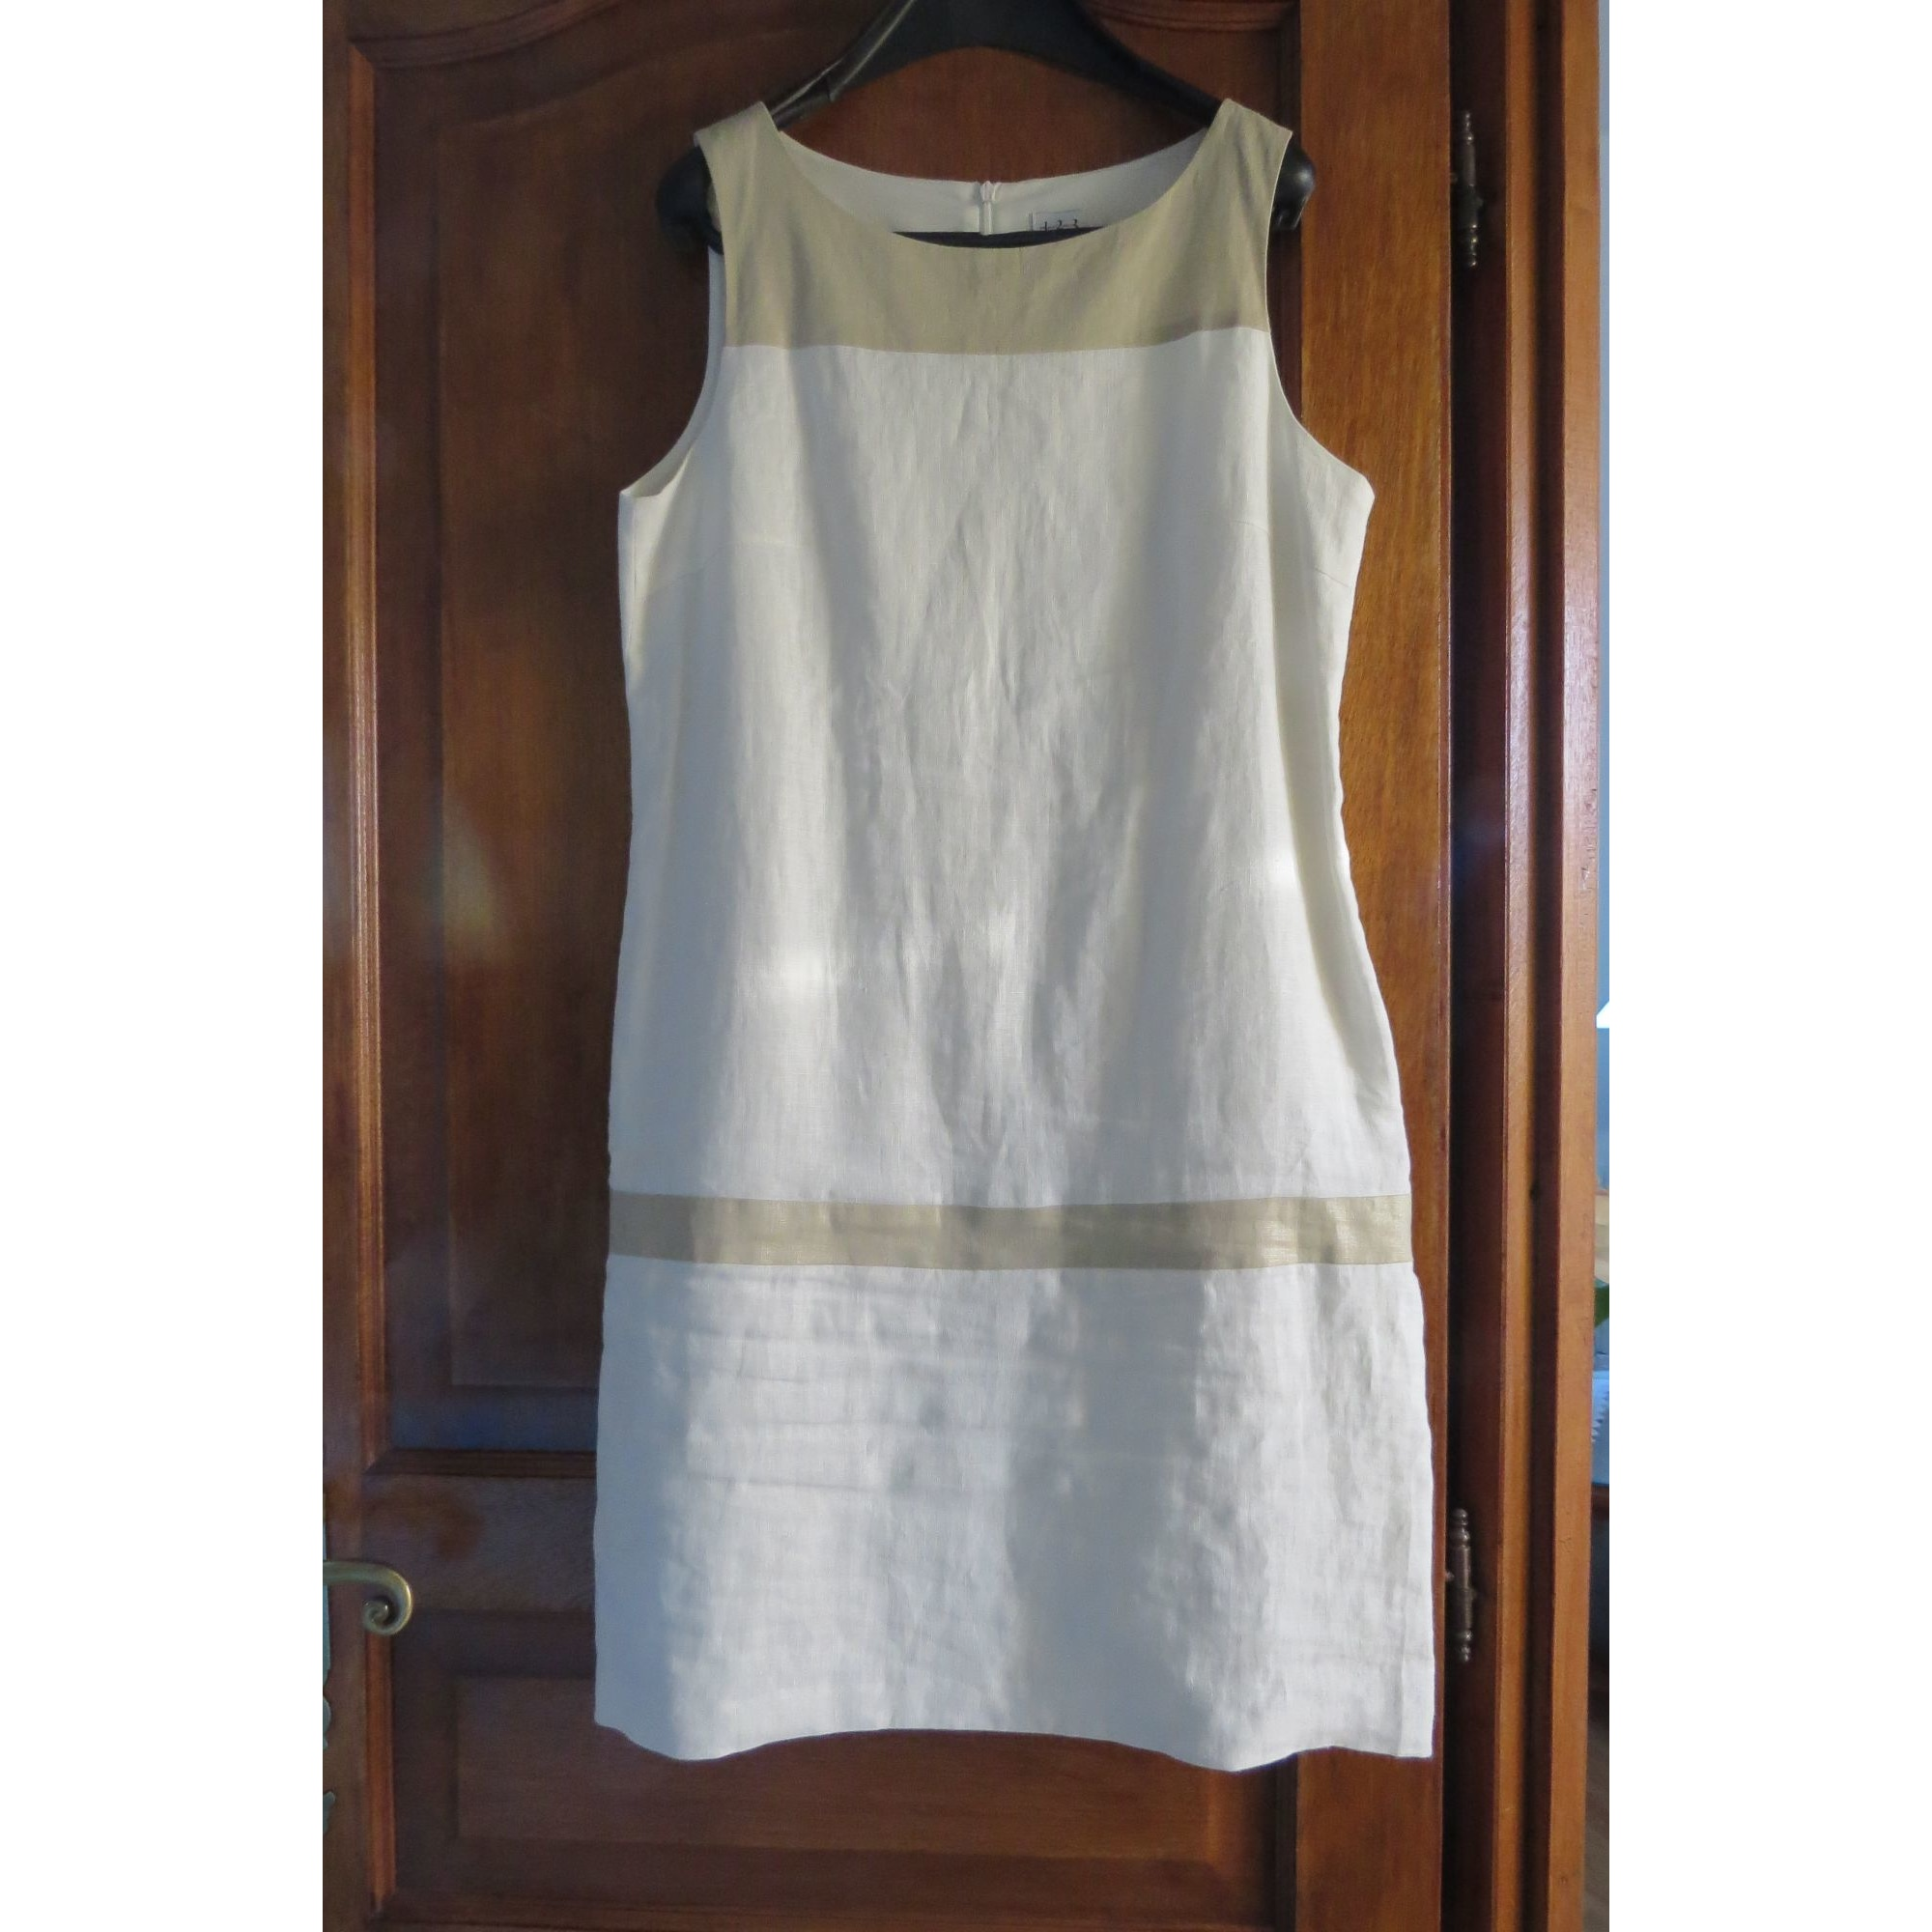 Tailleur robe 1.2.3 Blanc, blanc cassé, écru